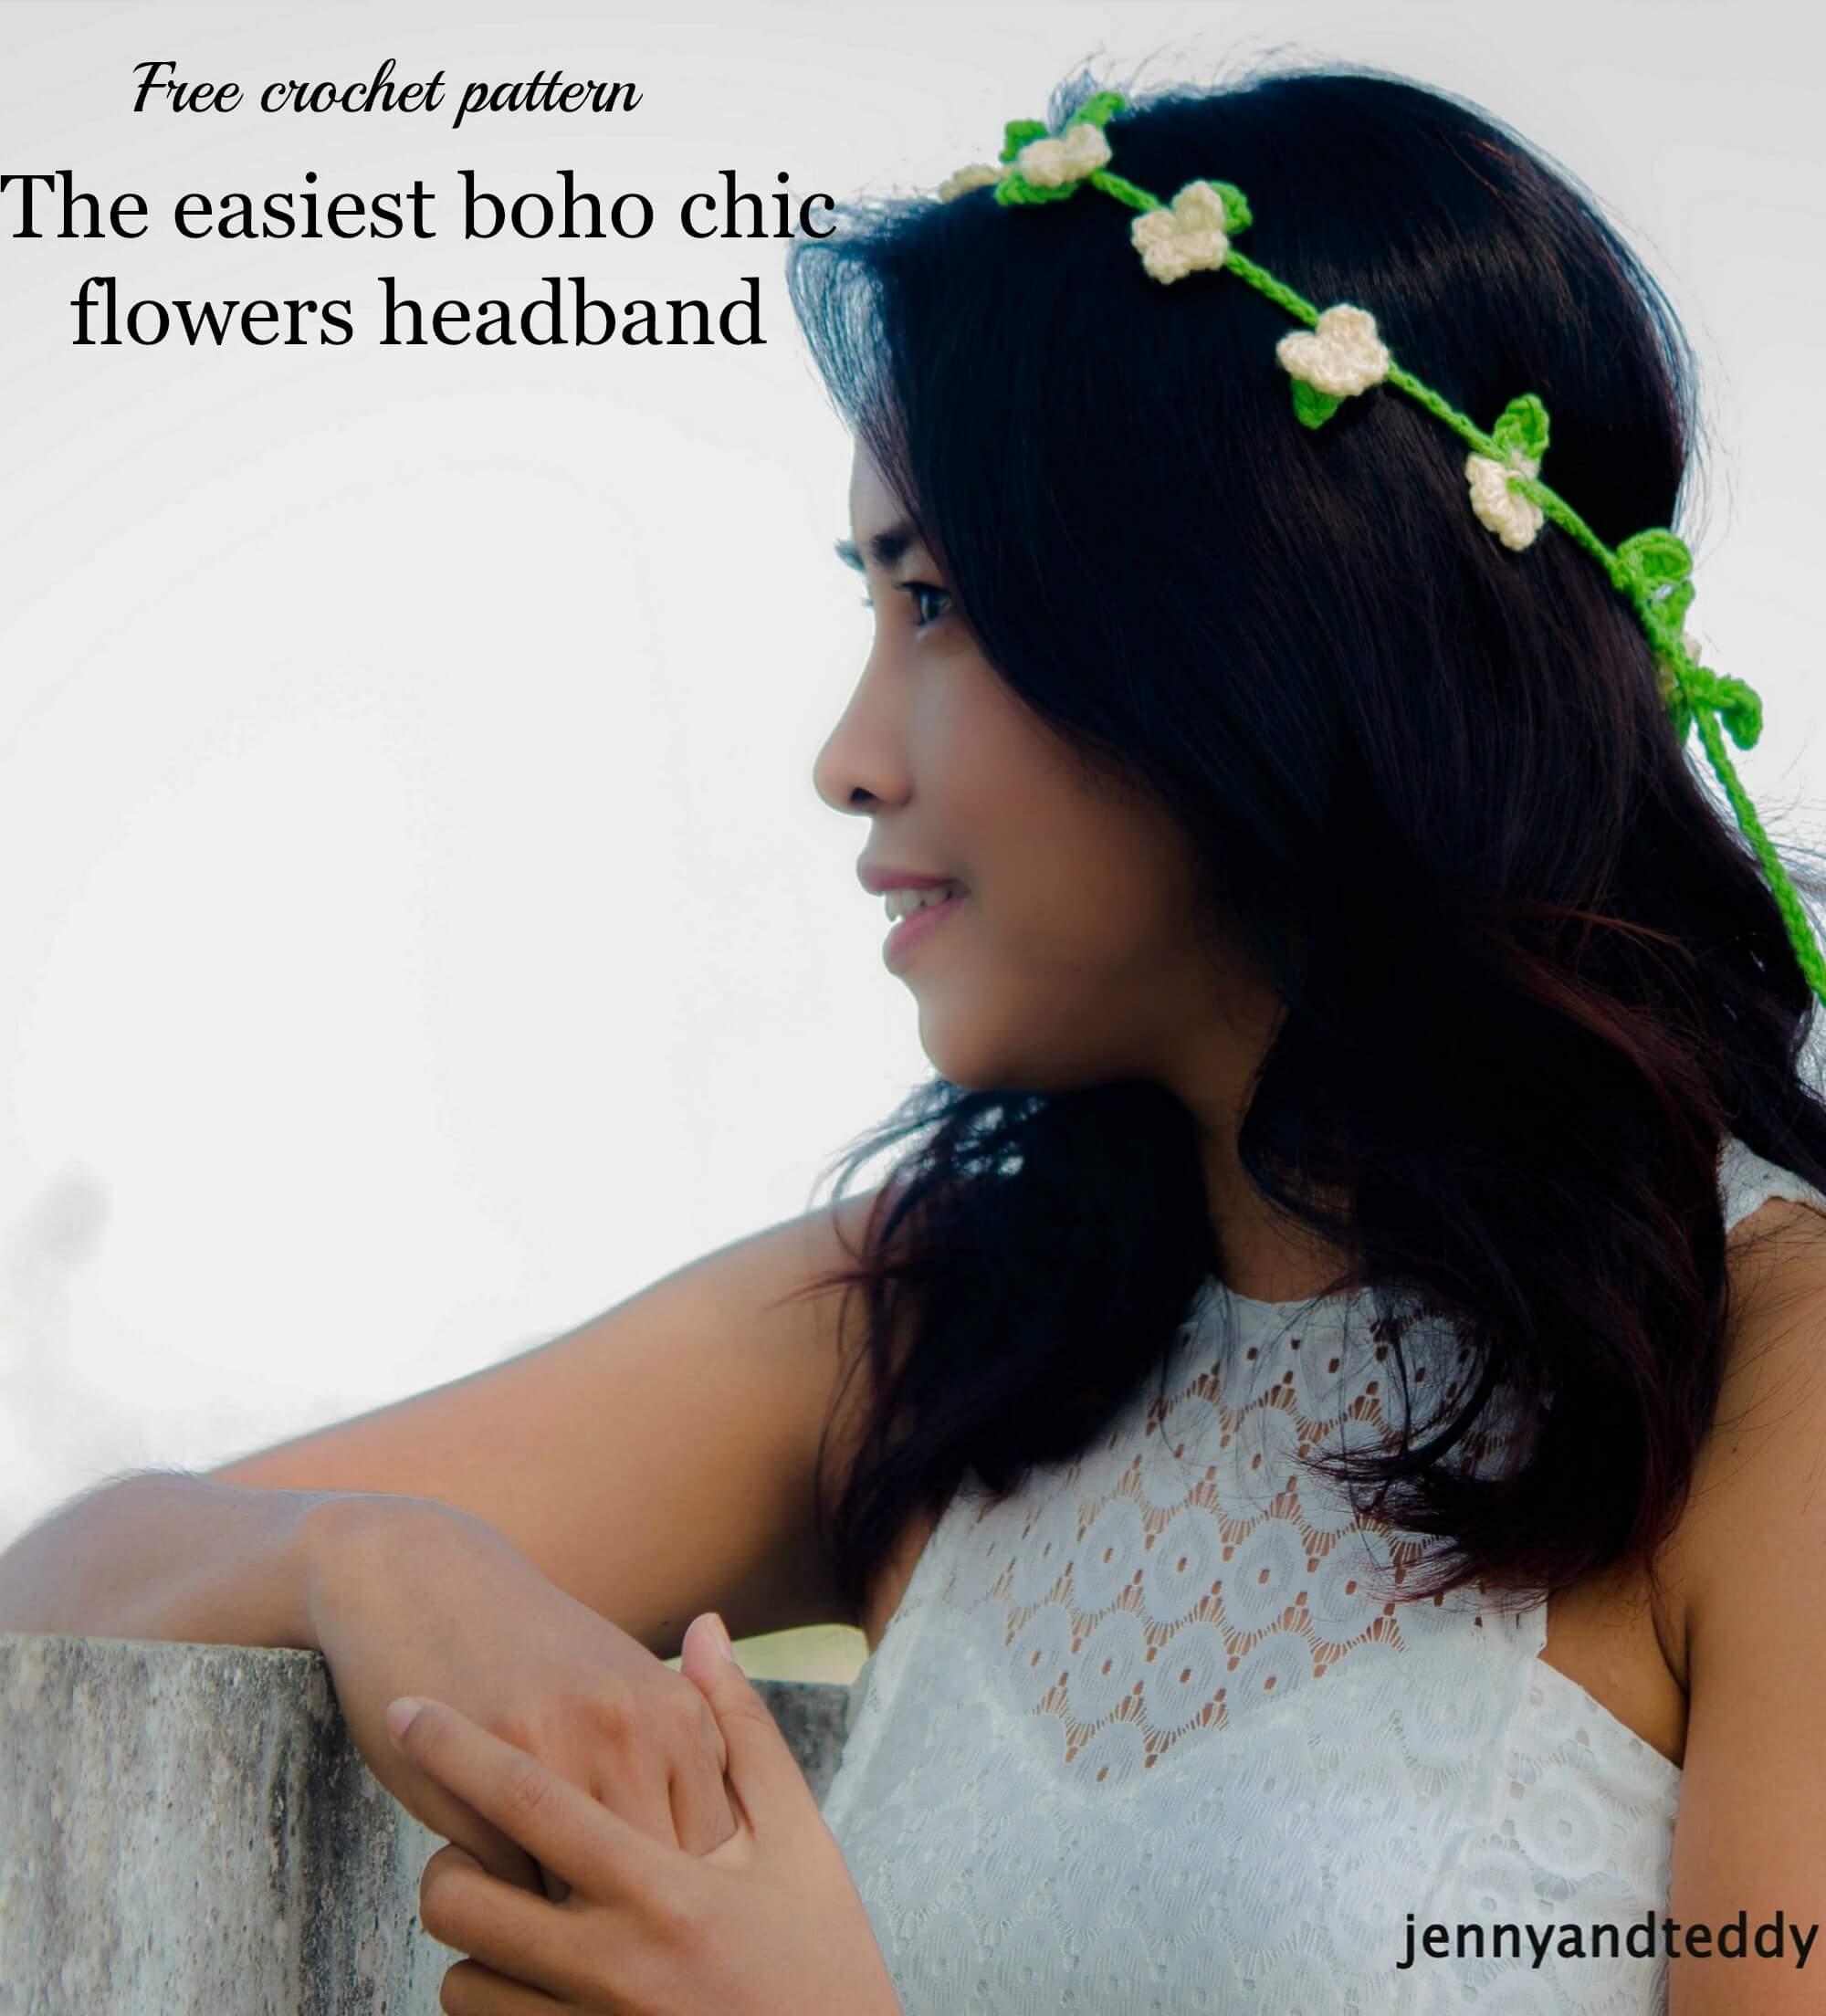 free crochet pattern the easiest boho chic flowers headband